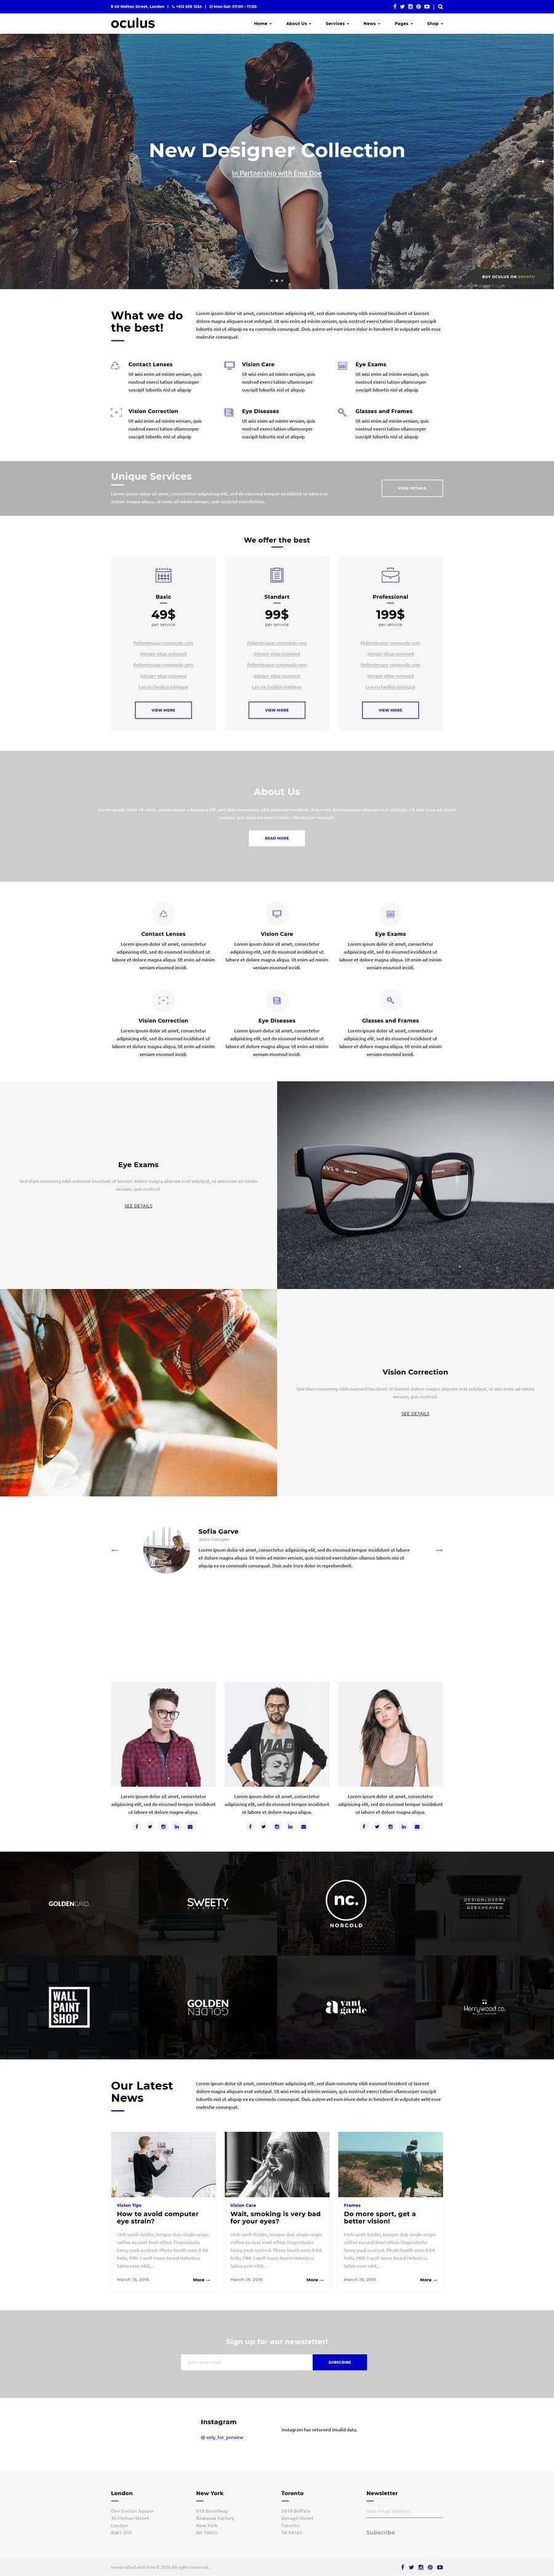 Konkurrenceindlæg #                                        51                                      for                                         Design an online shopping page for my website